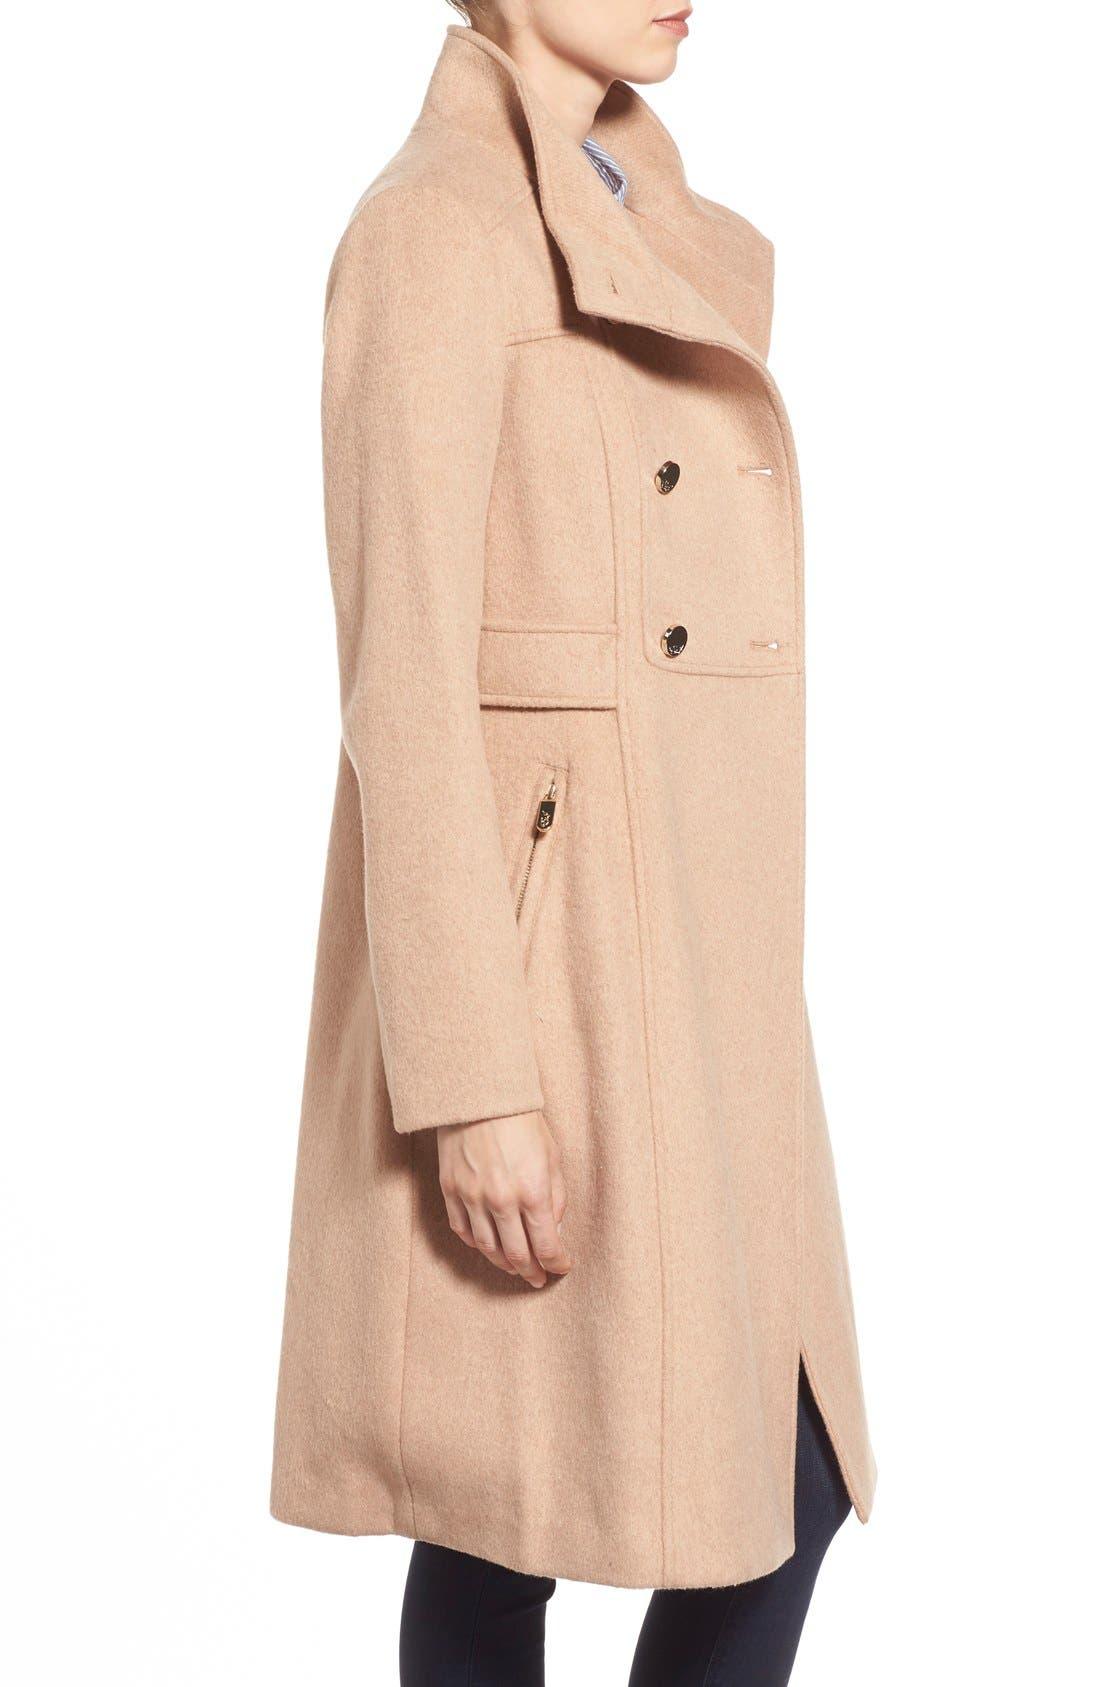 Wool Blend Long Military Coat,                             Alternate thumbnail 3, color,                             Camel